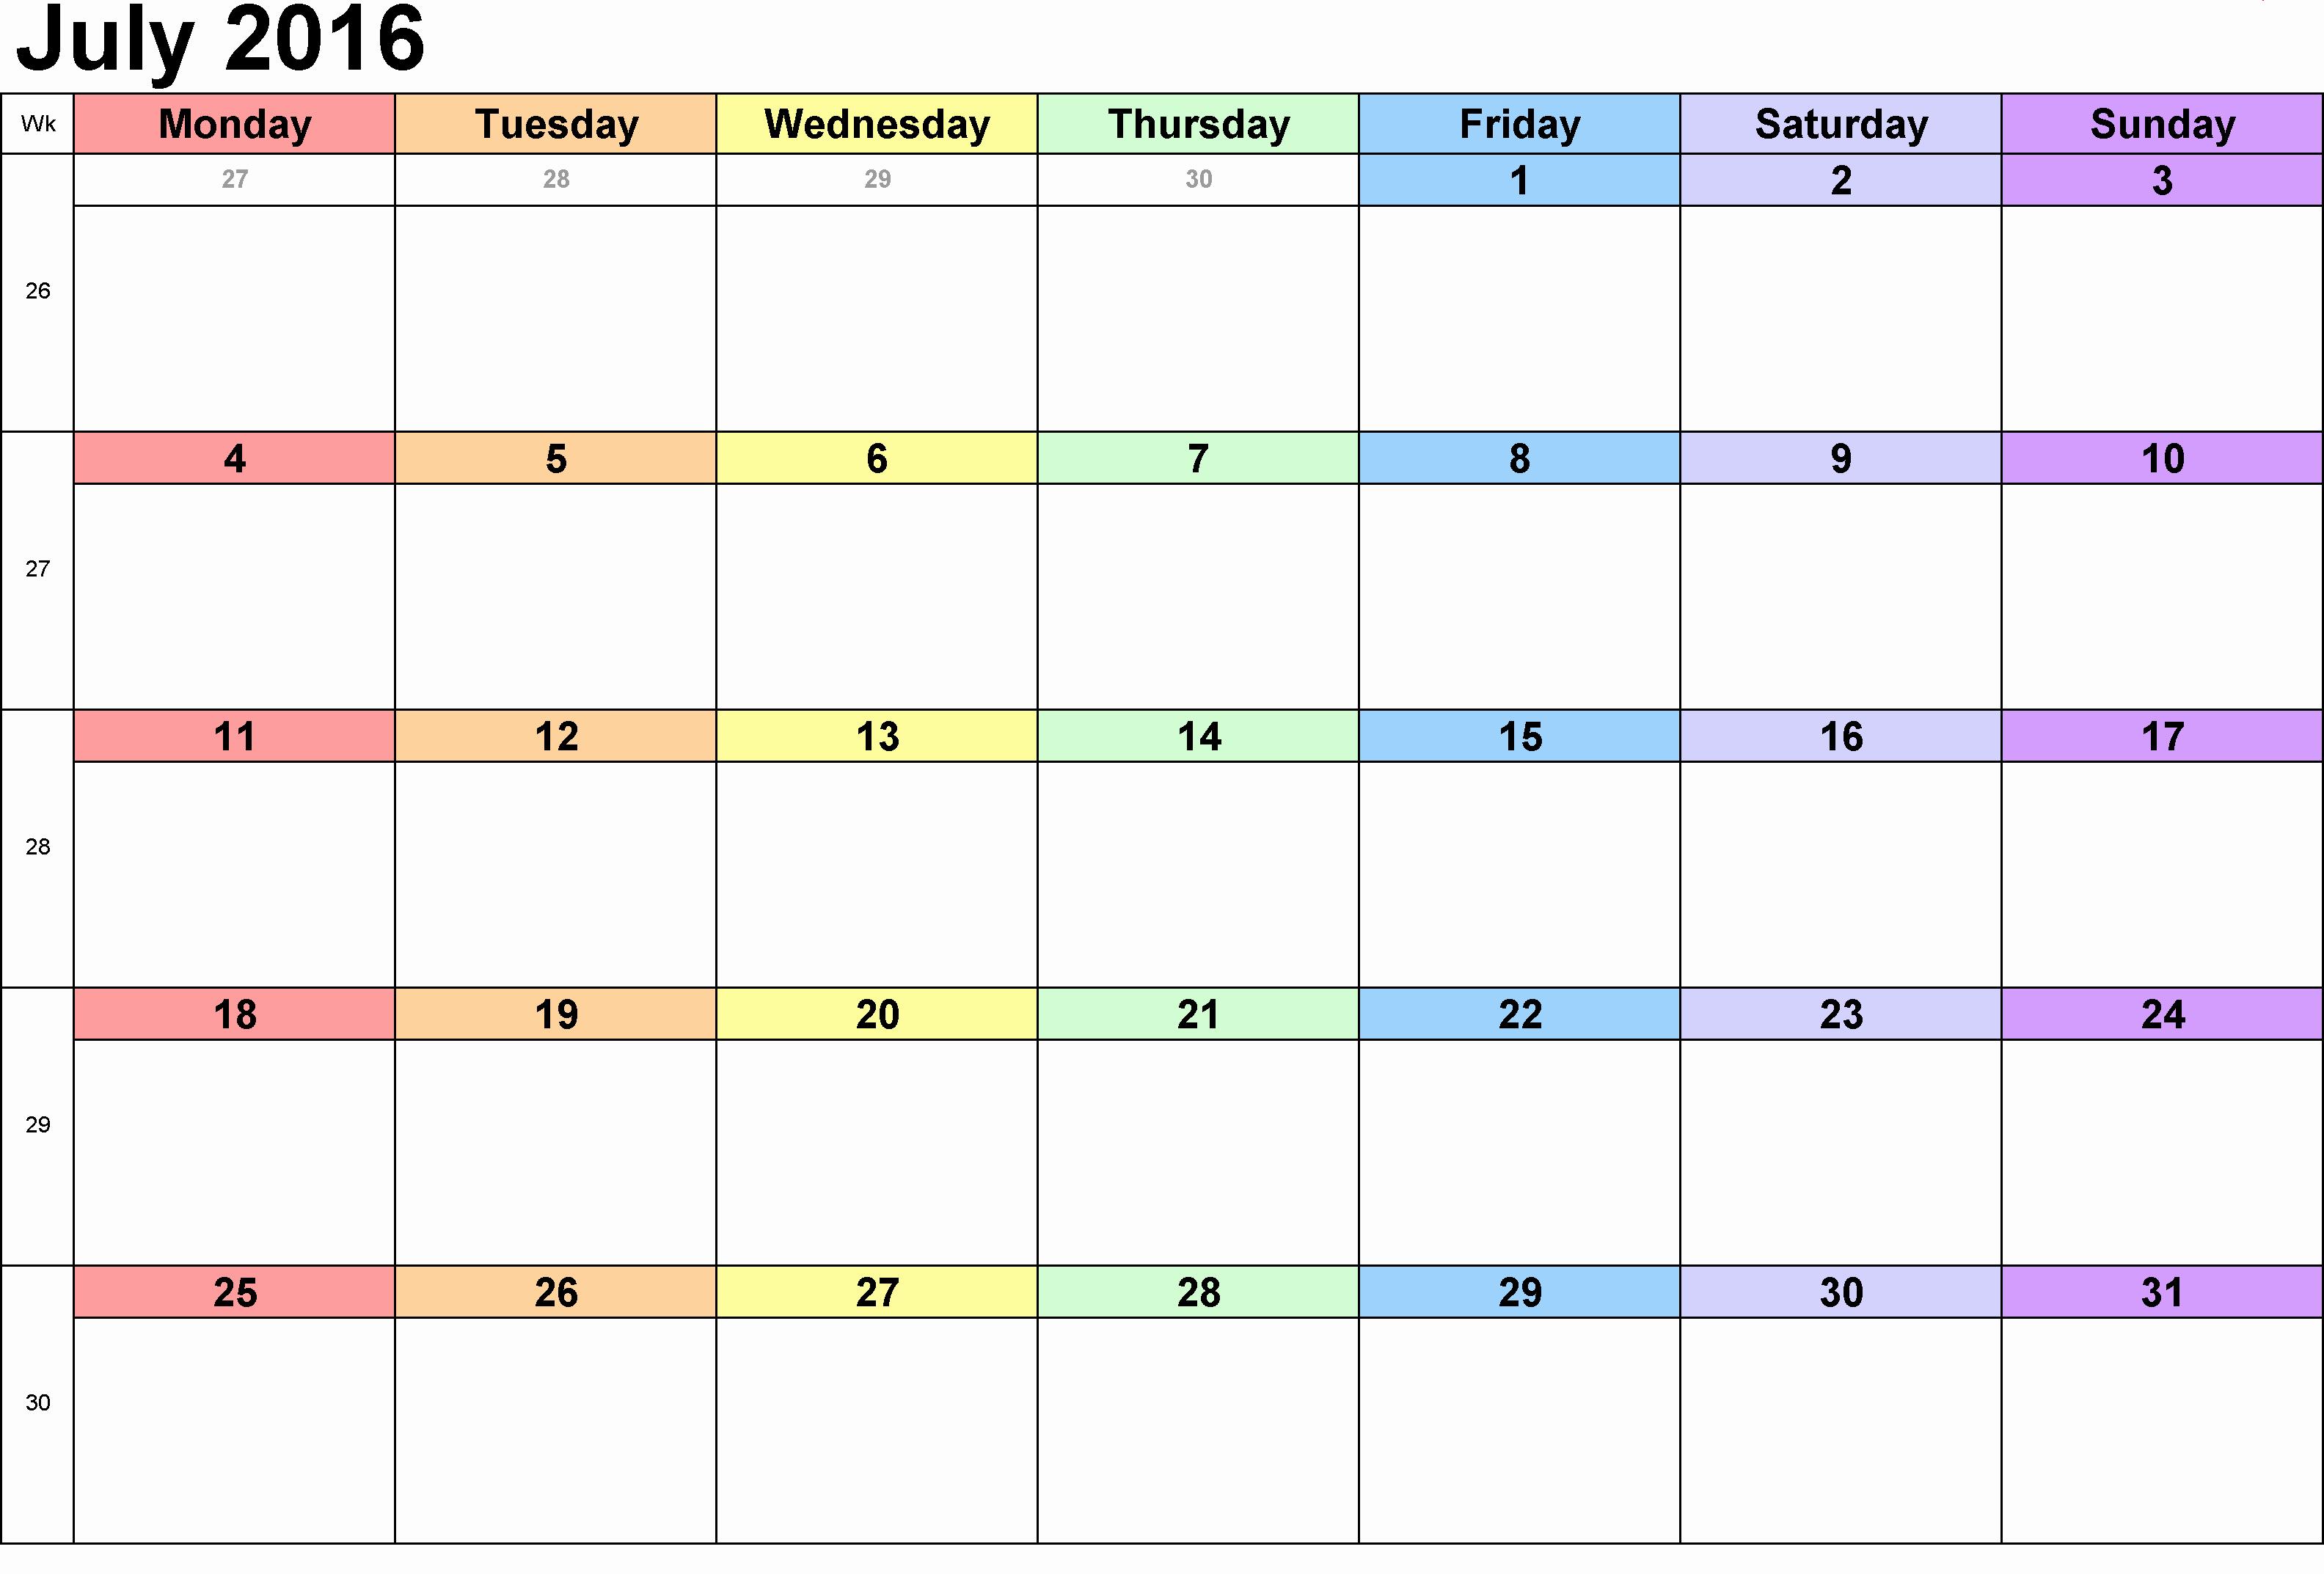 Free Printable Calendar 2016 Templates Lovely [free] Printable Calendar Templates 2016 Part 2